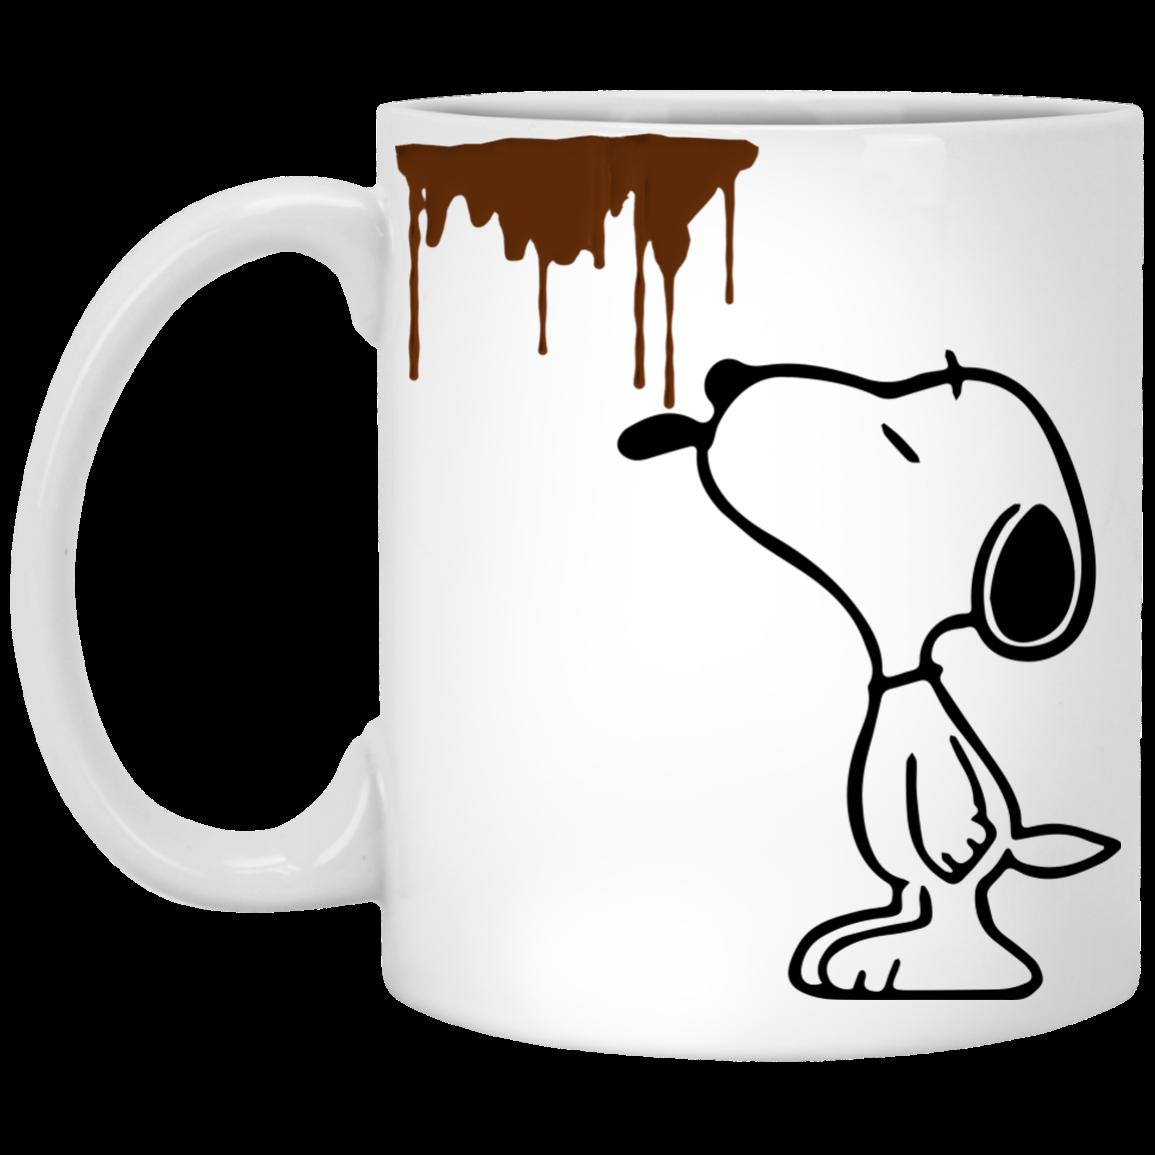 Snoopy dirty funny mugs. Mug clipart grey coffee